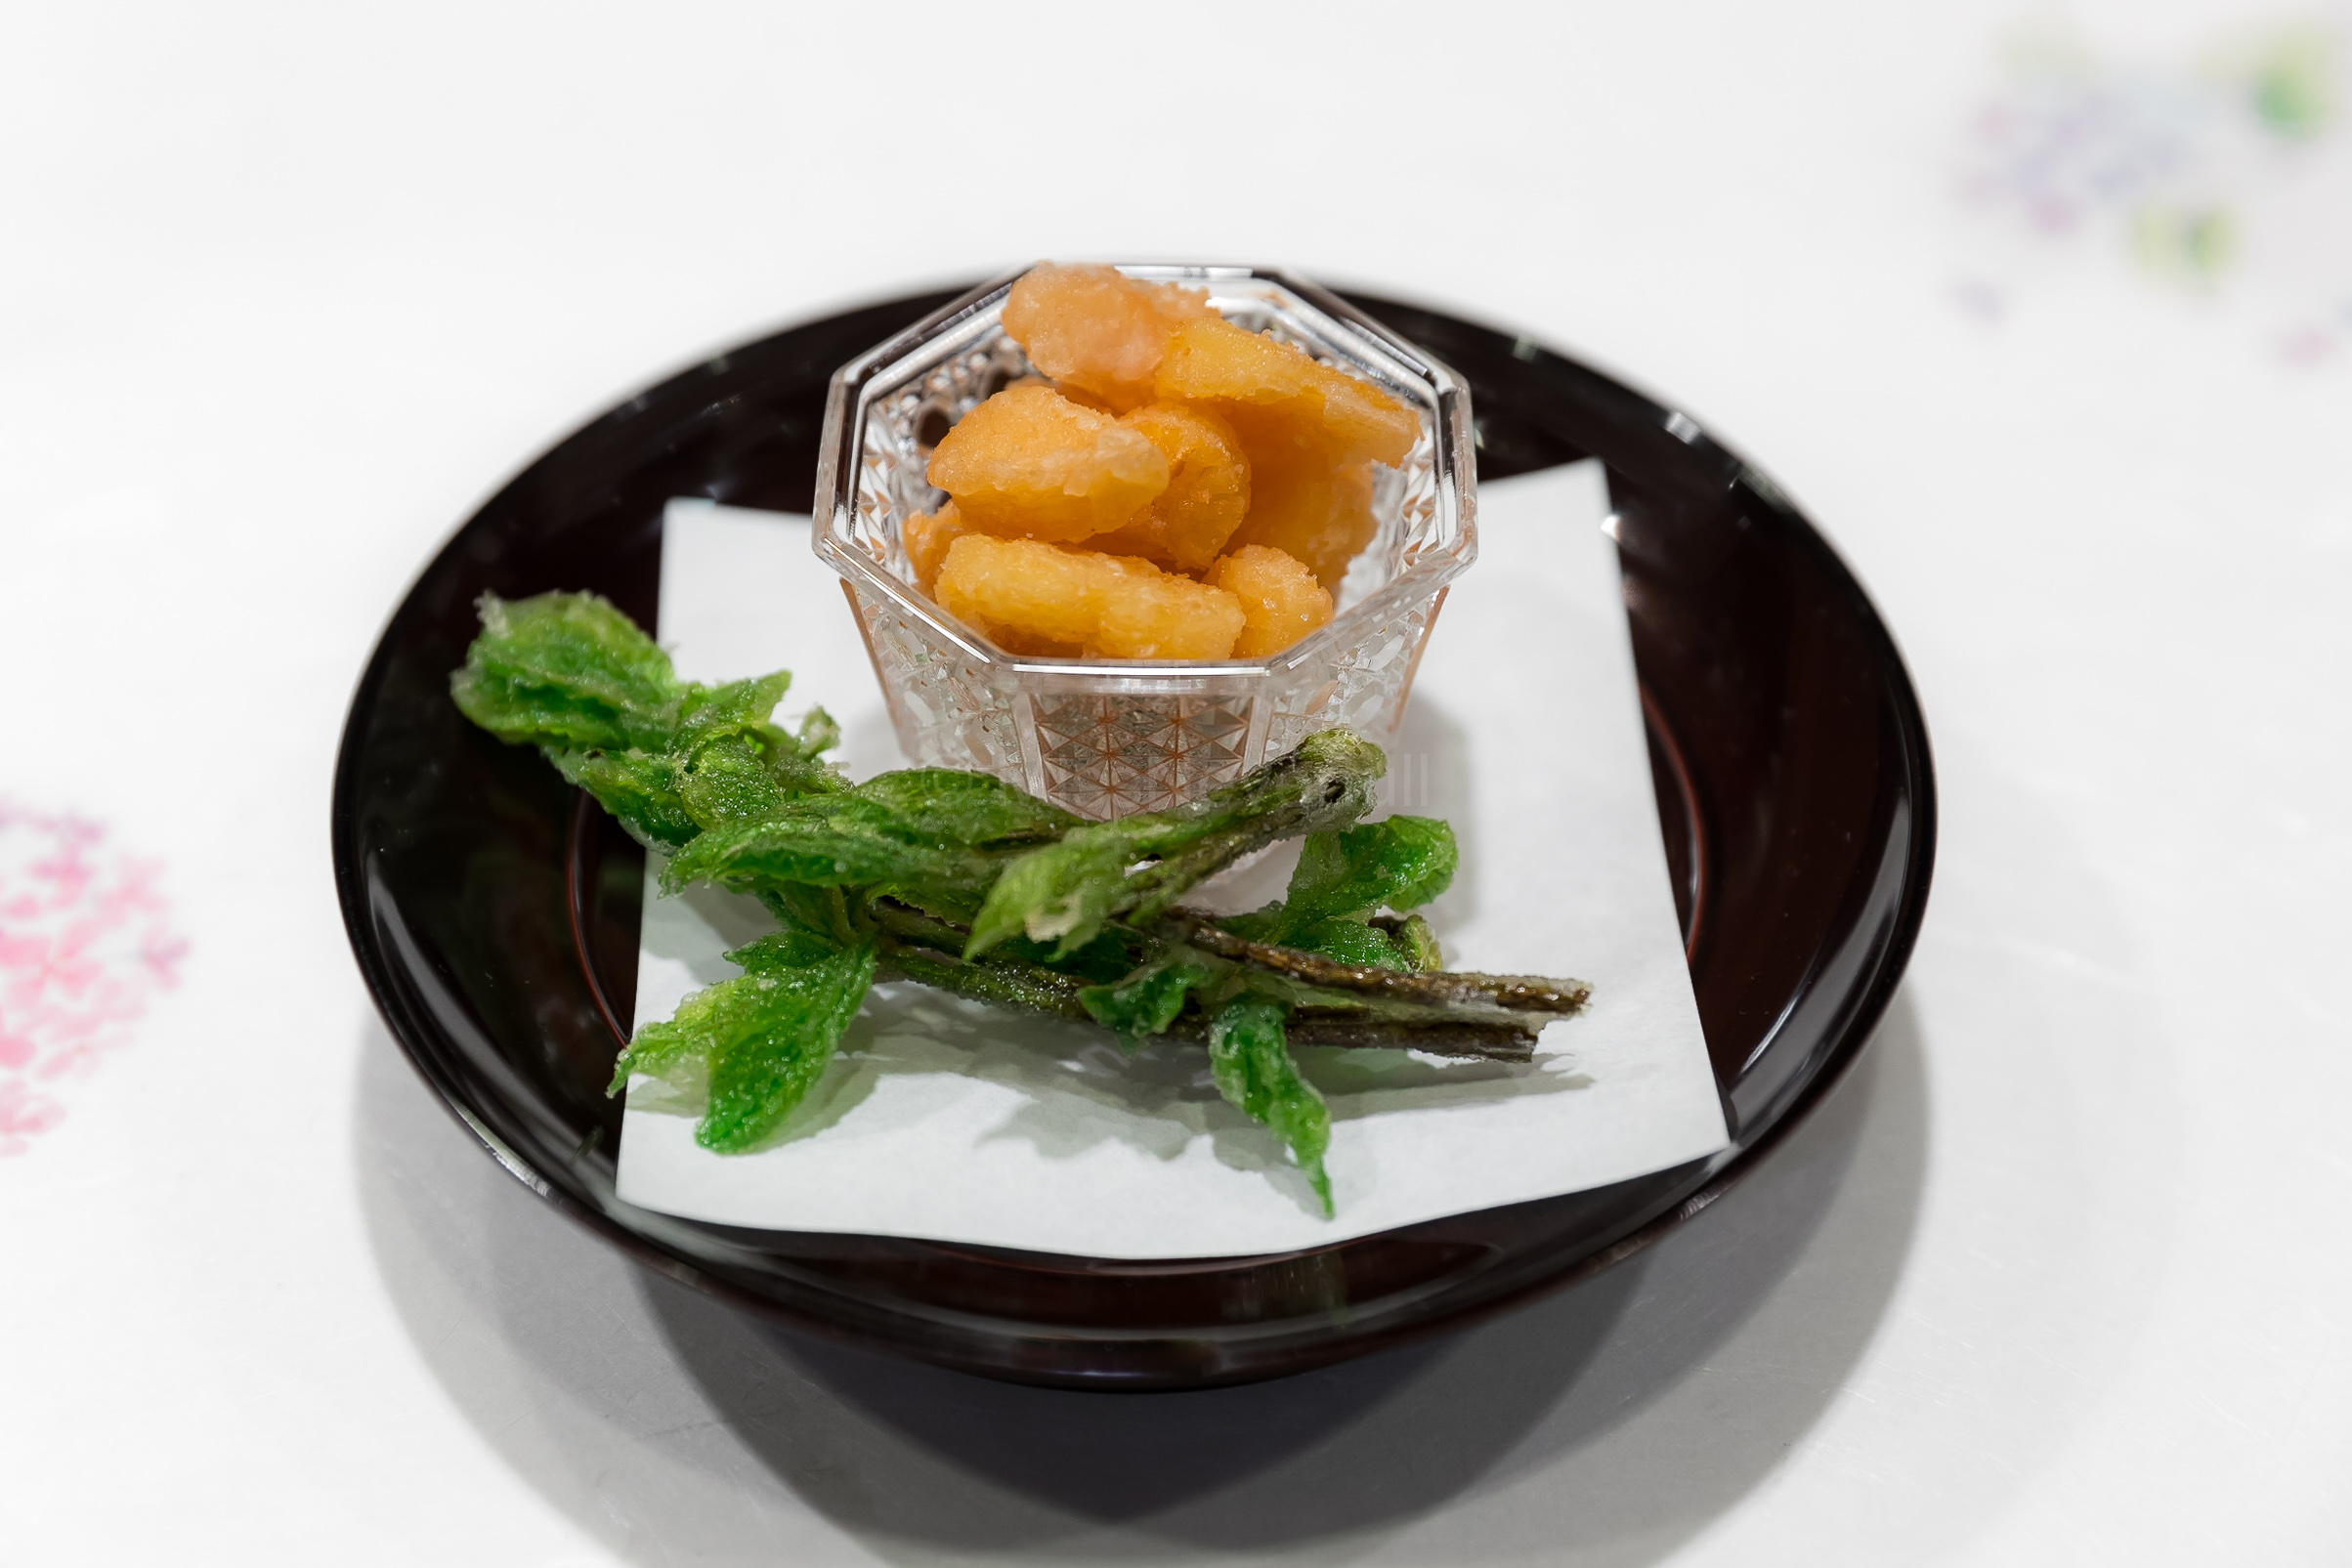 6.Deep-fried Kojiabura and Tsubugai (whelk) | コシアブラ、つぶ貝